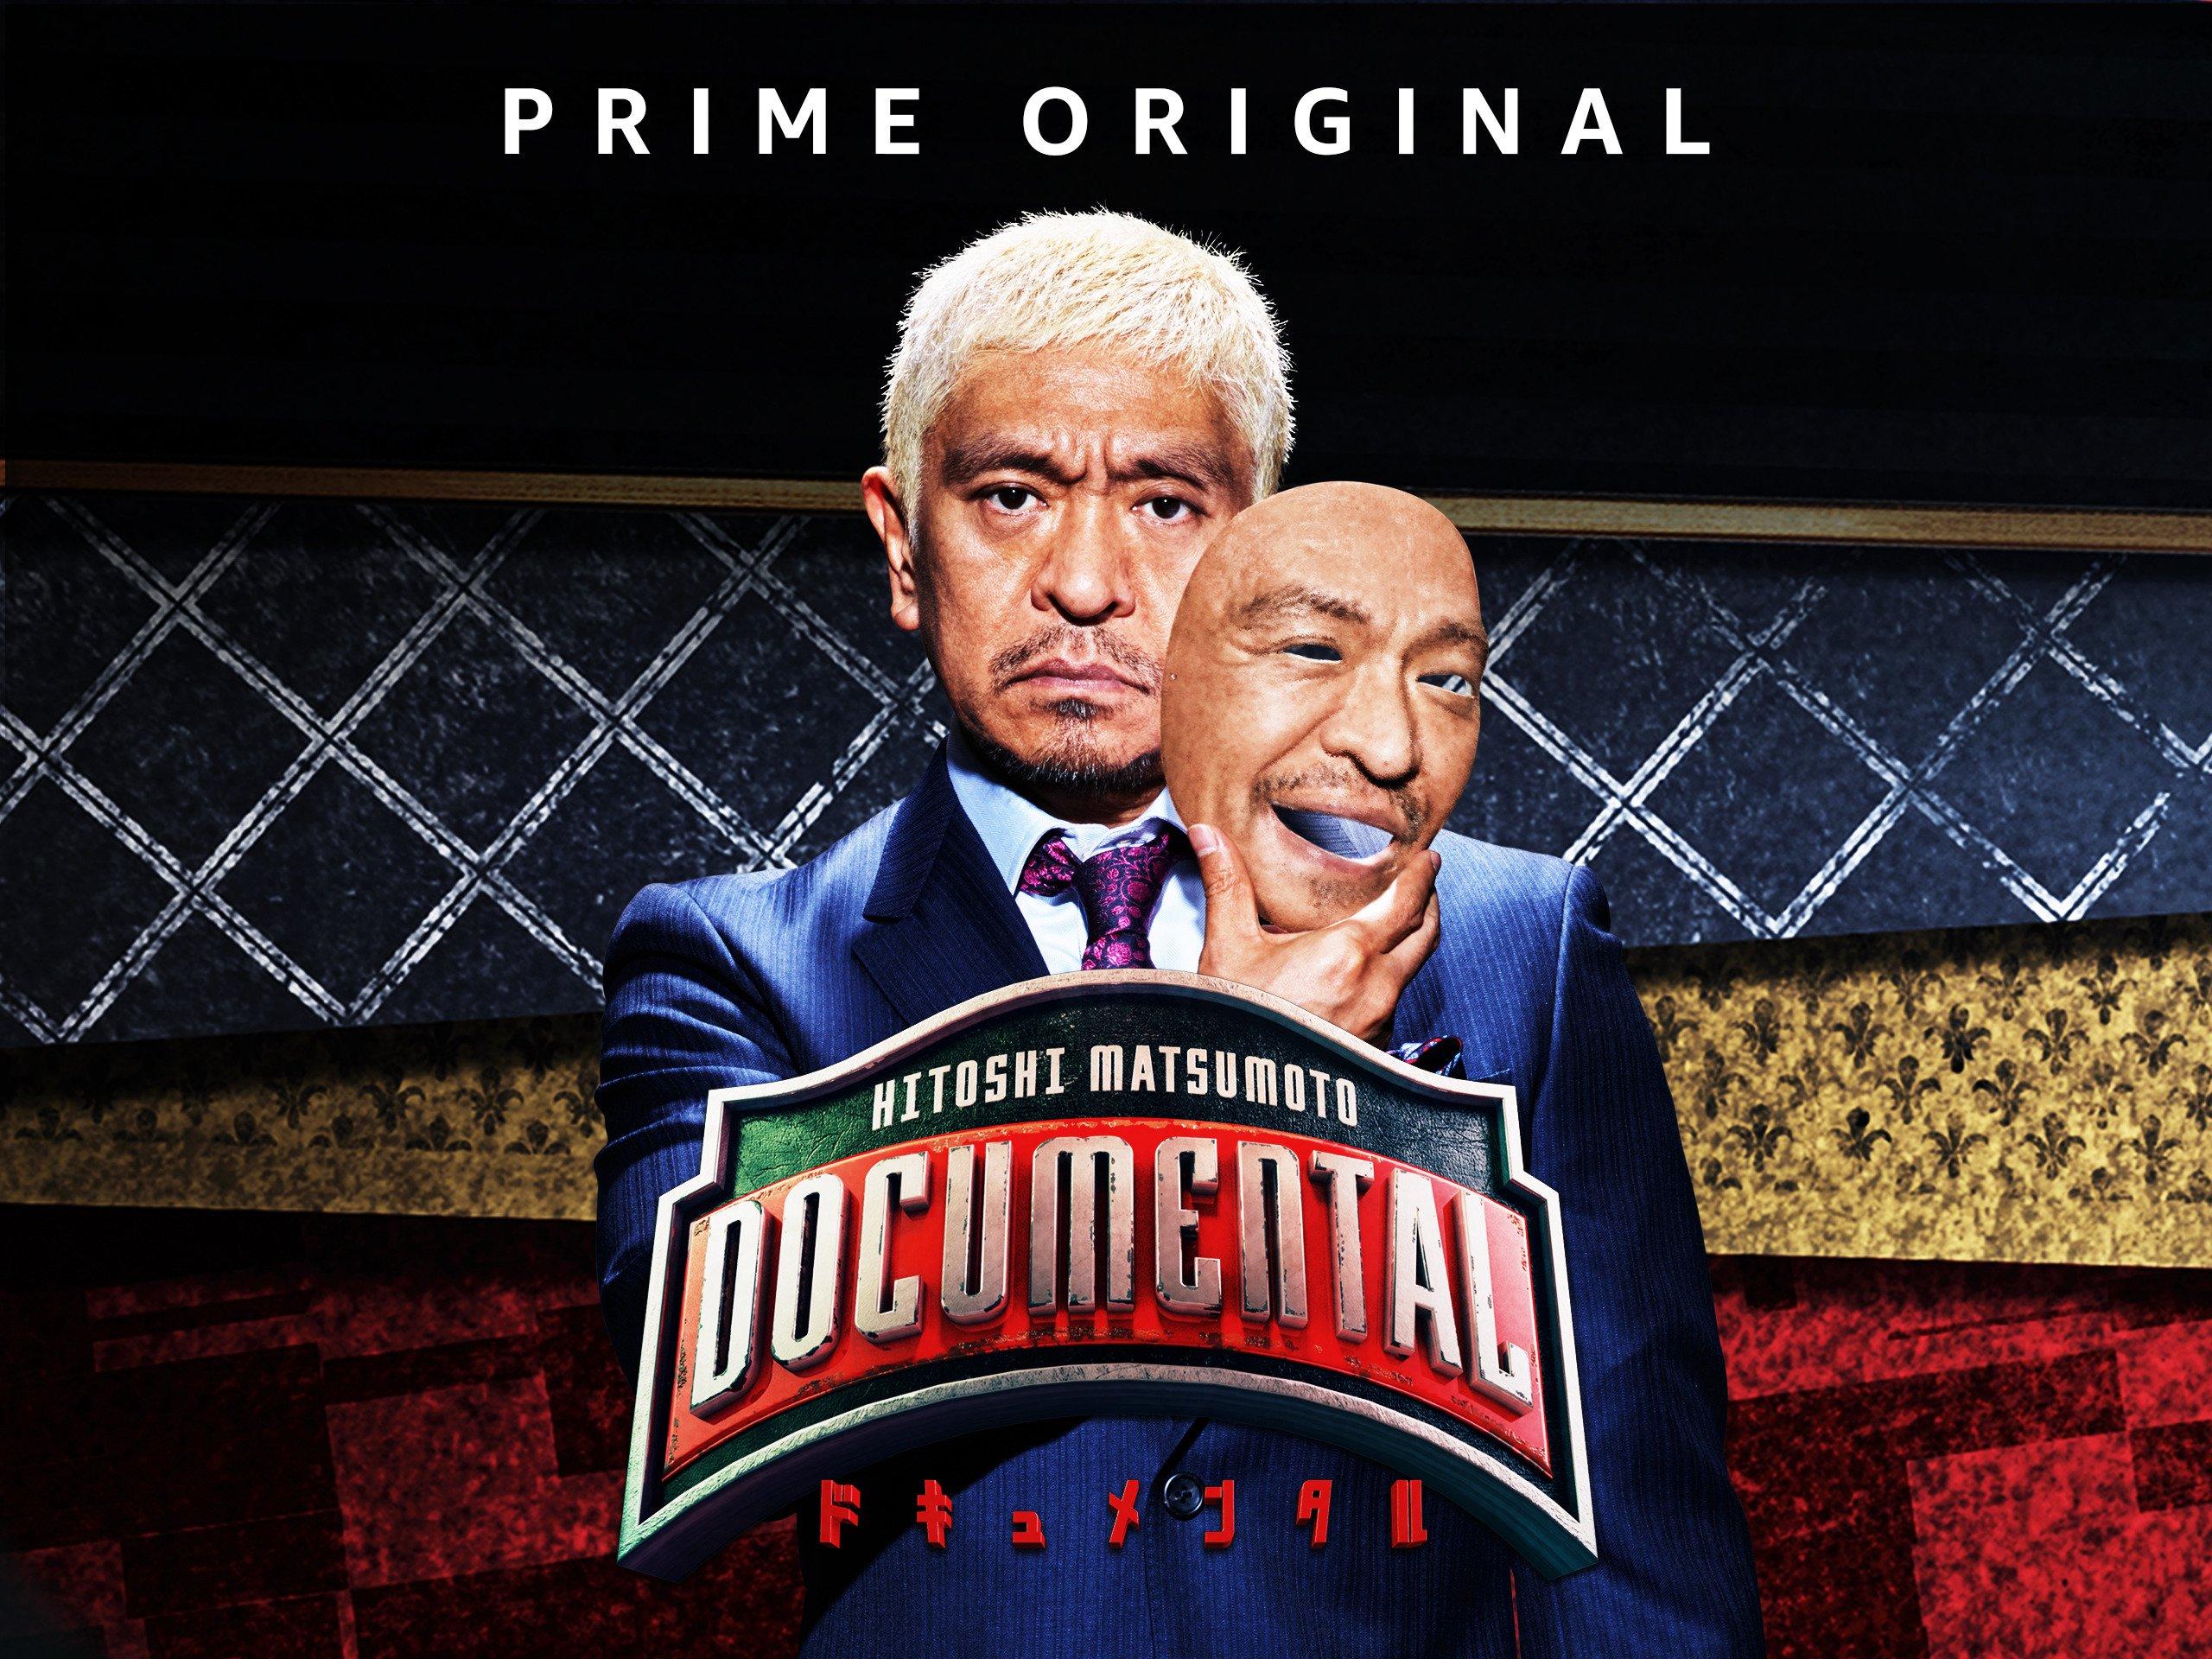 HITOSHI MATSUMOTO Presents Documental on Amazon Prime Instant Video UK